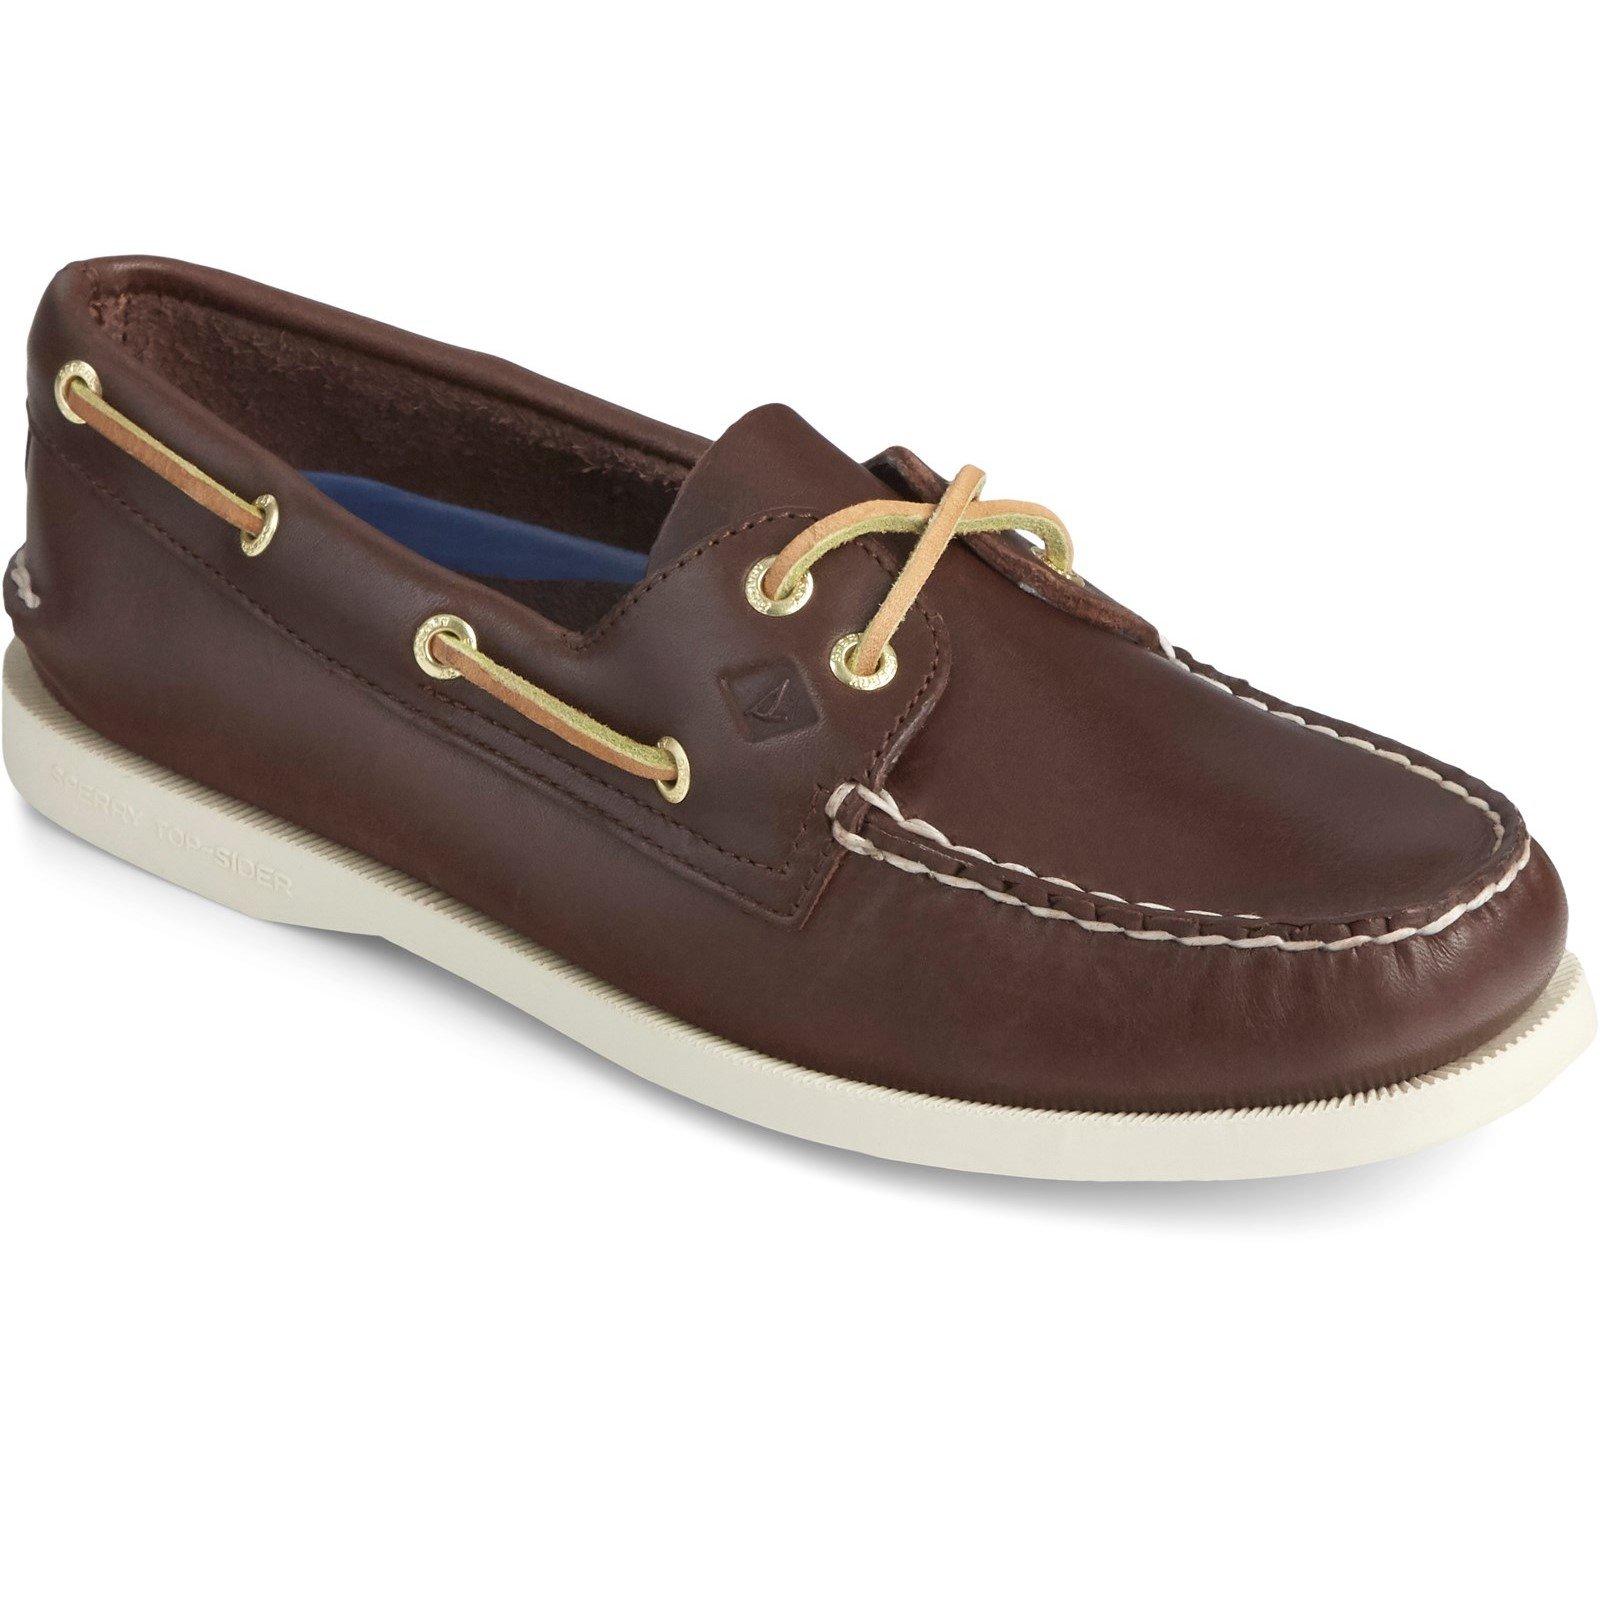 Sperry Women's Authentic Original Boat Shoe Various Colours 31535 - Brown 7.5